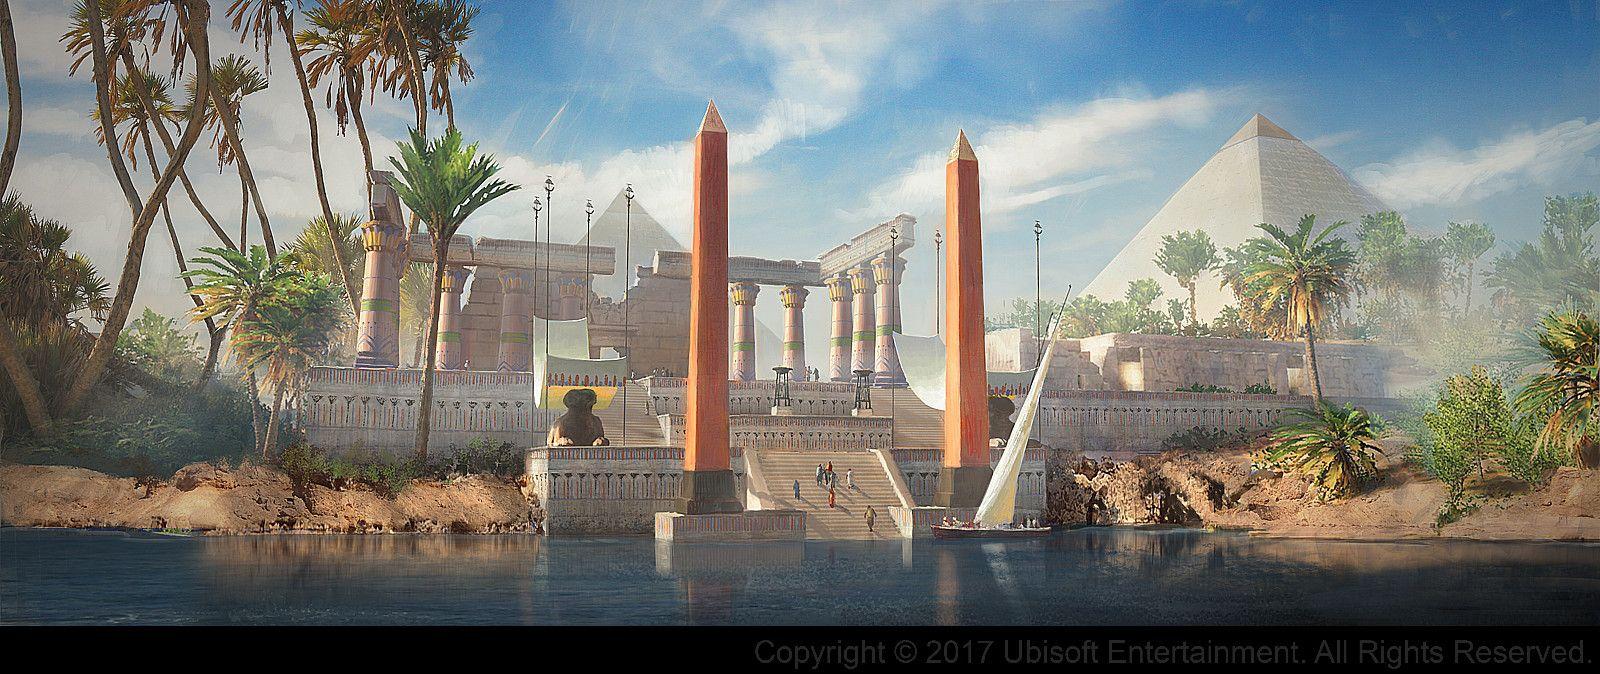 Calendario Ubisoft.Ubisoft Assassin S Creed Origins Art Blast Landscape And